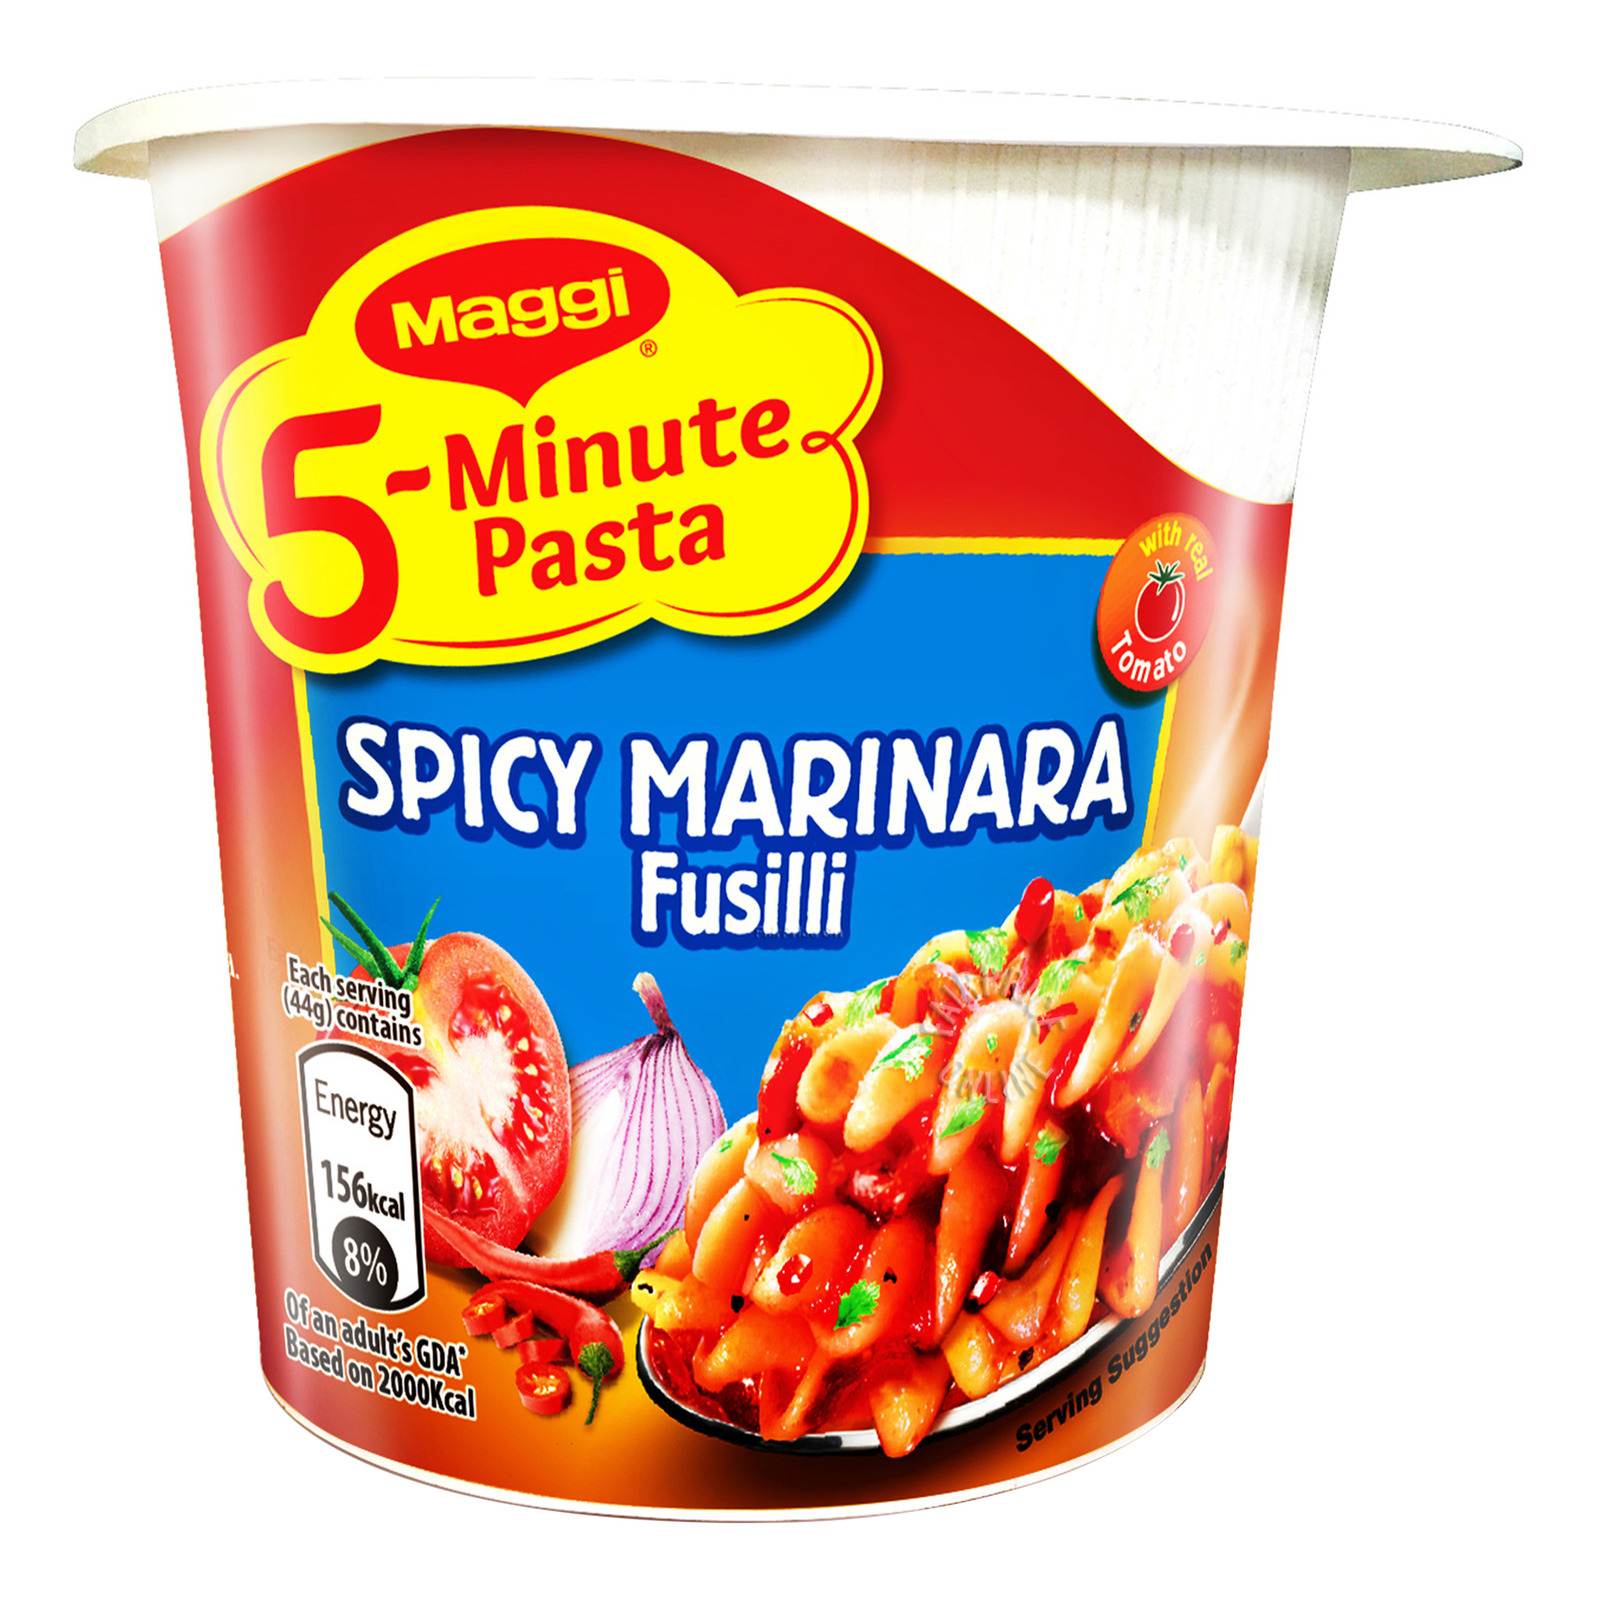 Maggi 5-Minute Instant Cup Pasta - Spicy Marinara Fusilli